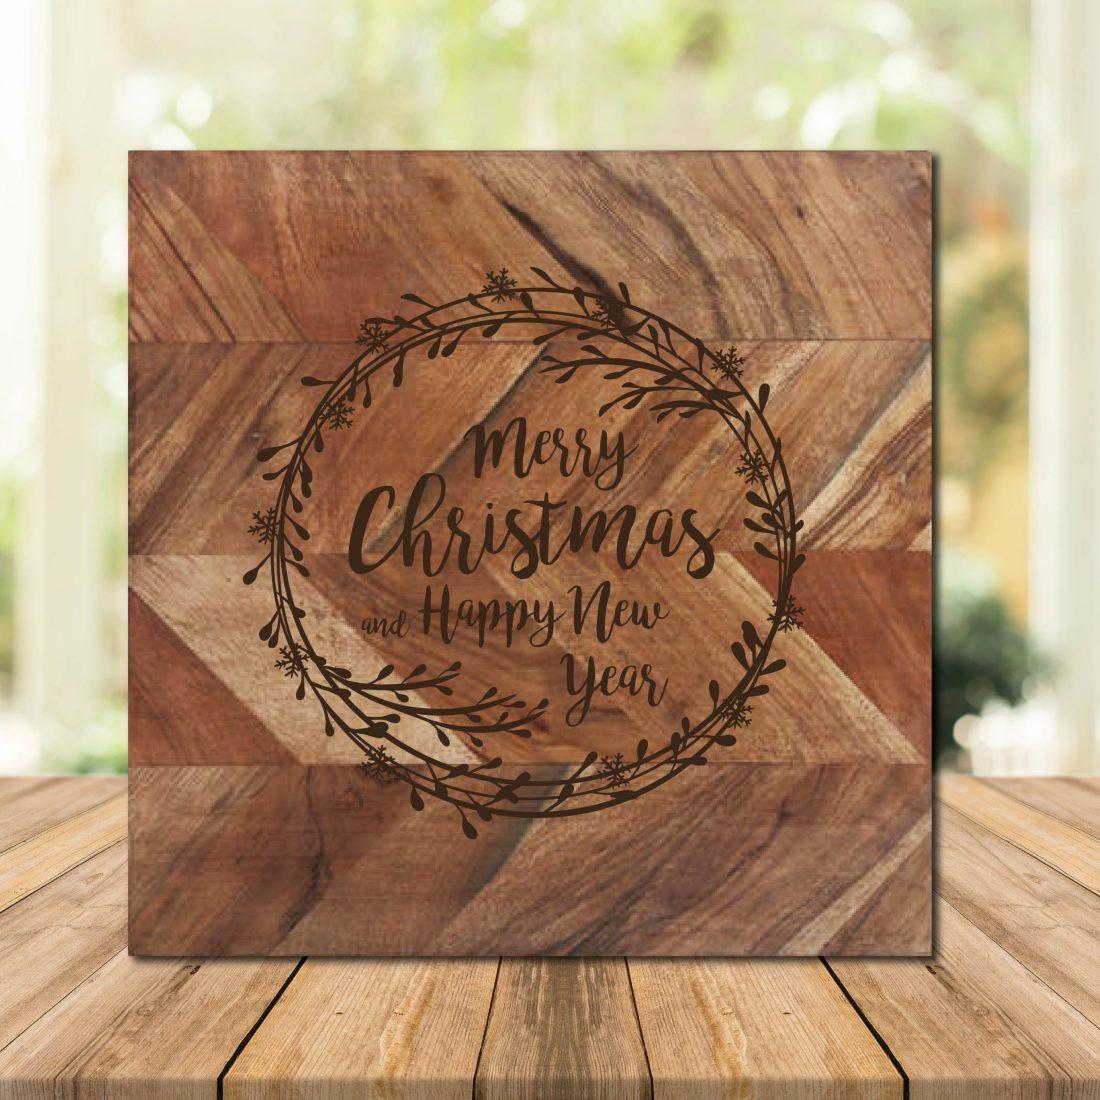 Merry Christmas Wreath Chopping Board